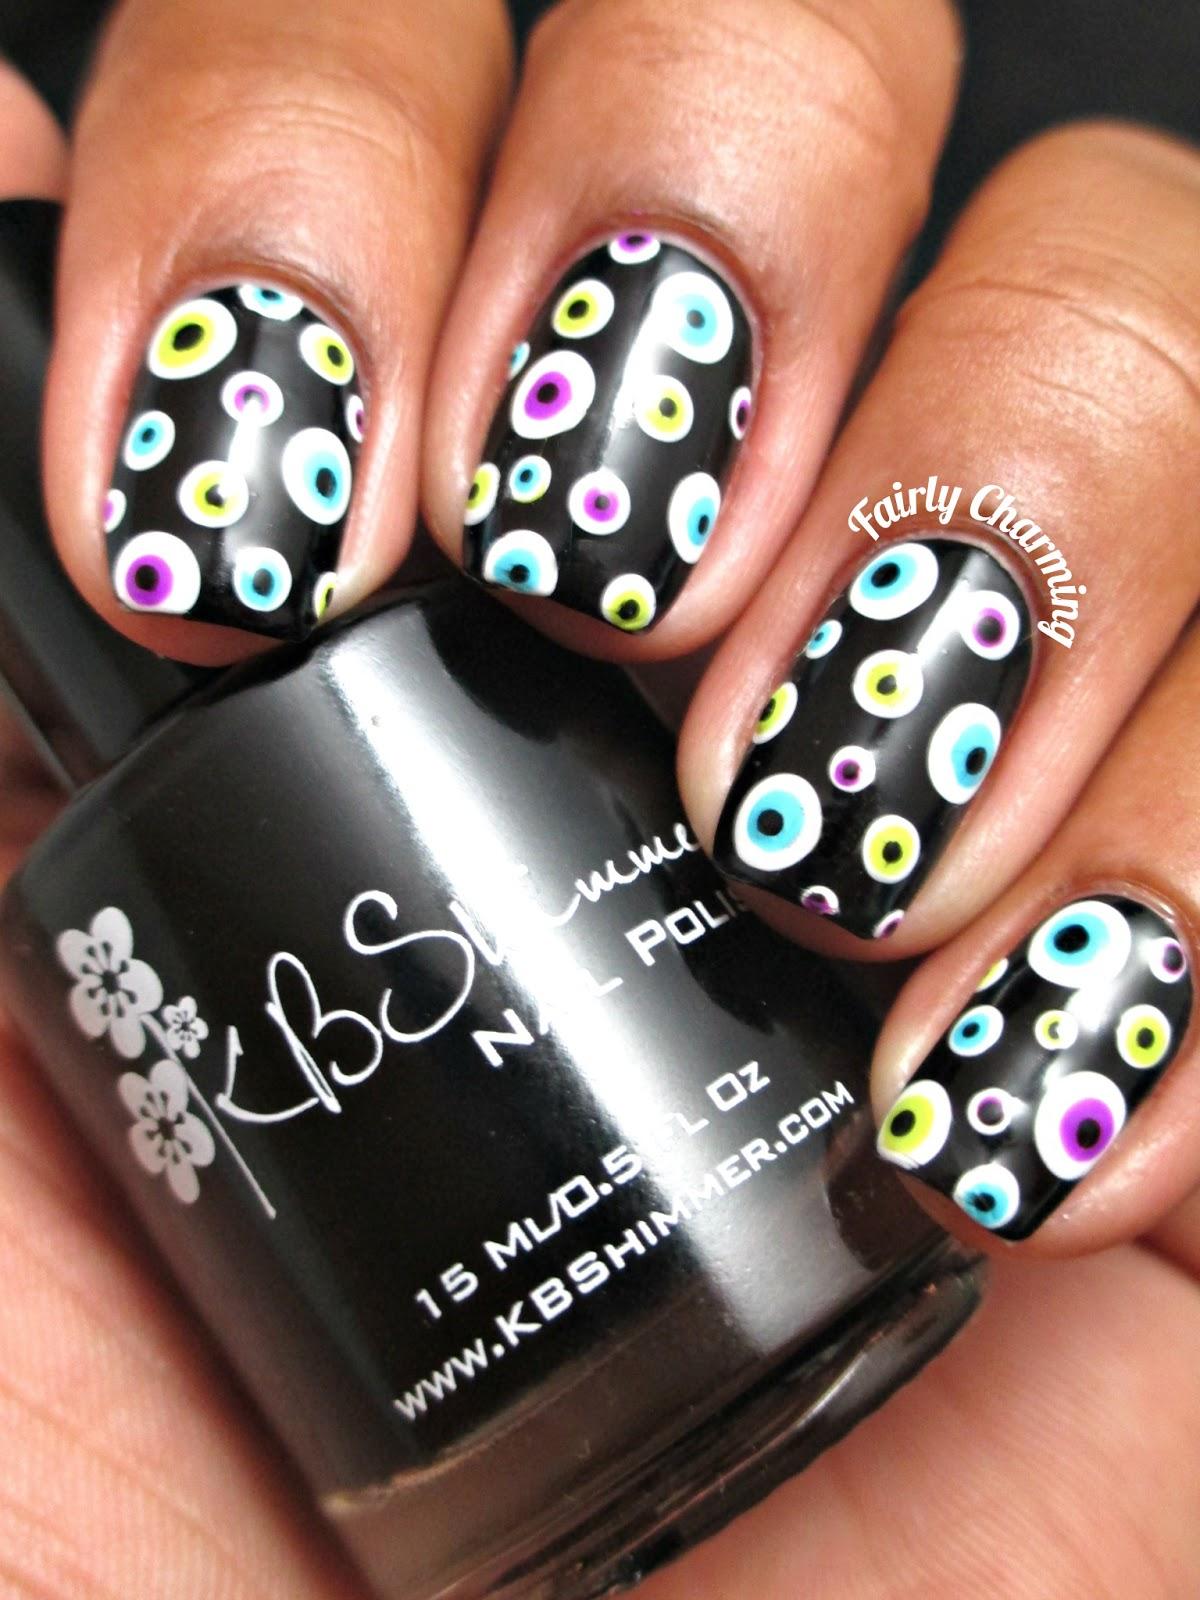 Fairly Charming: Eyeballs!